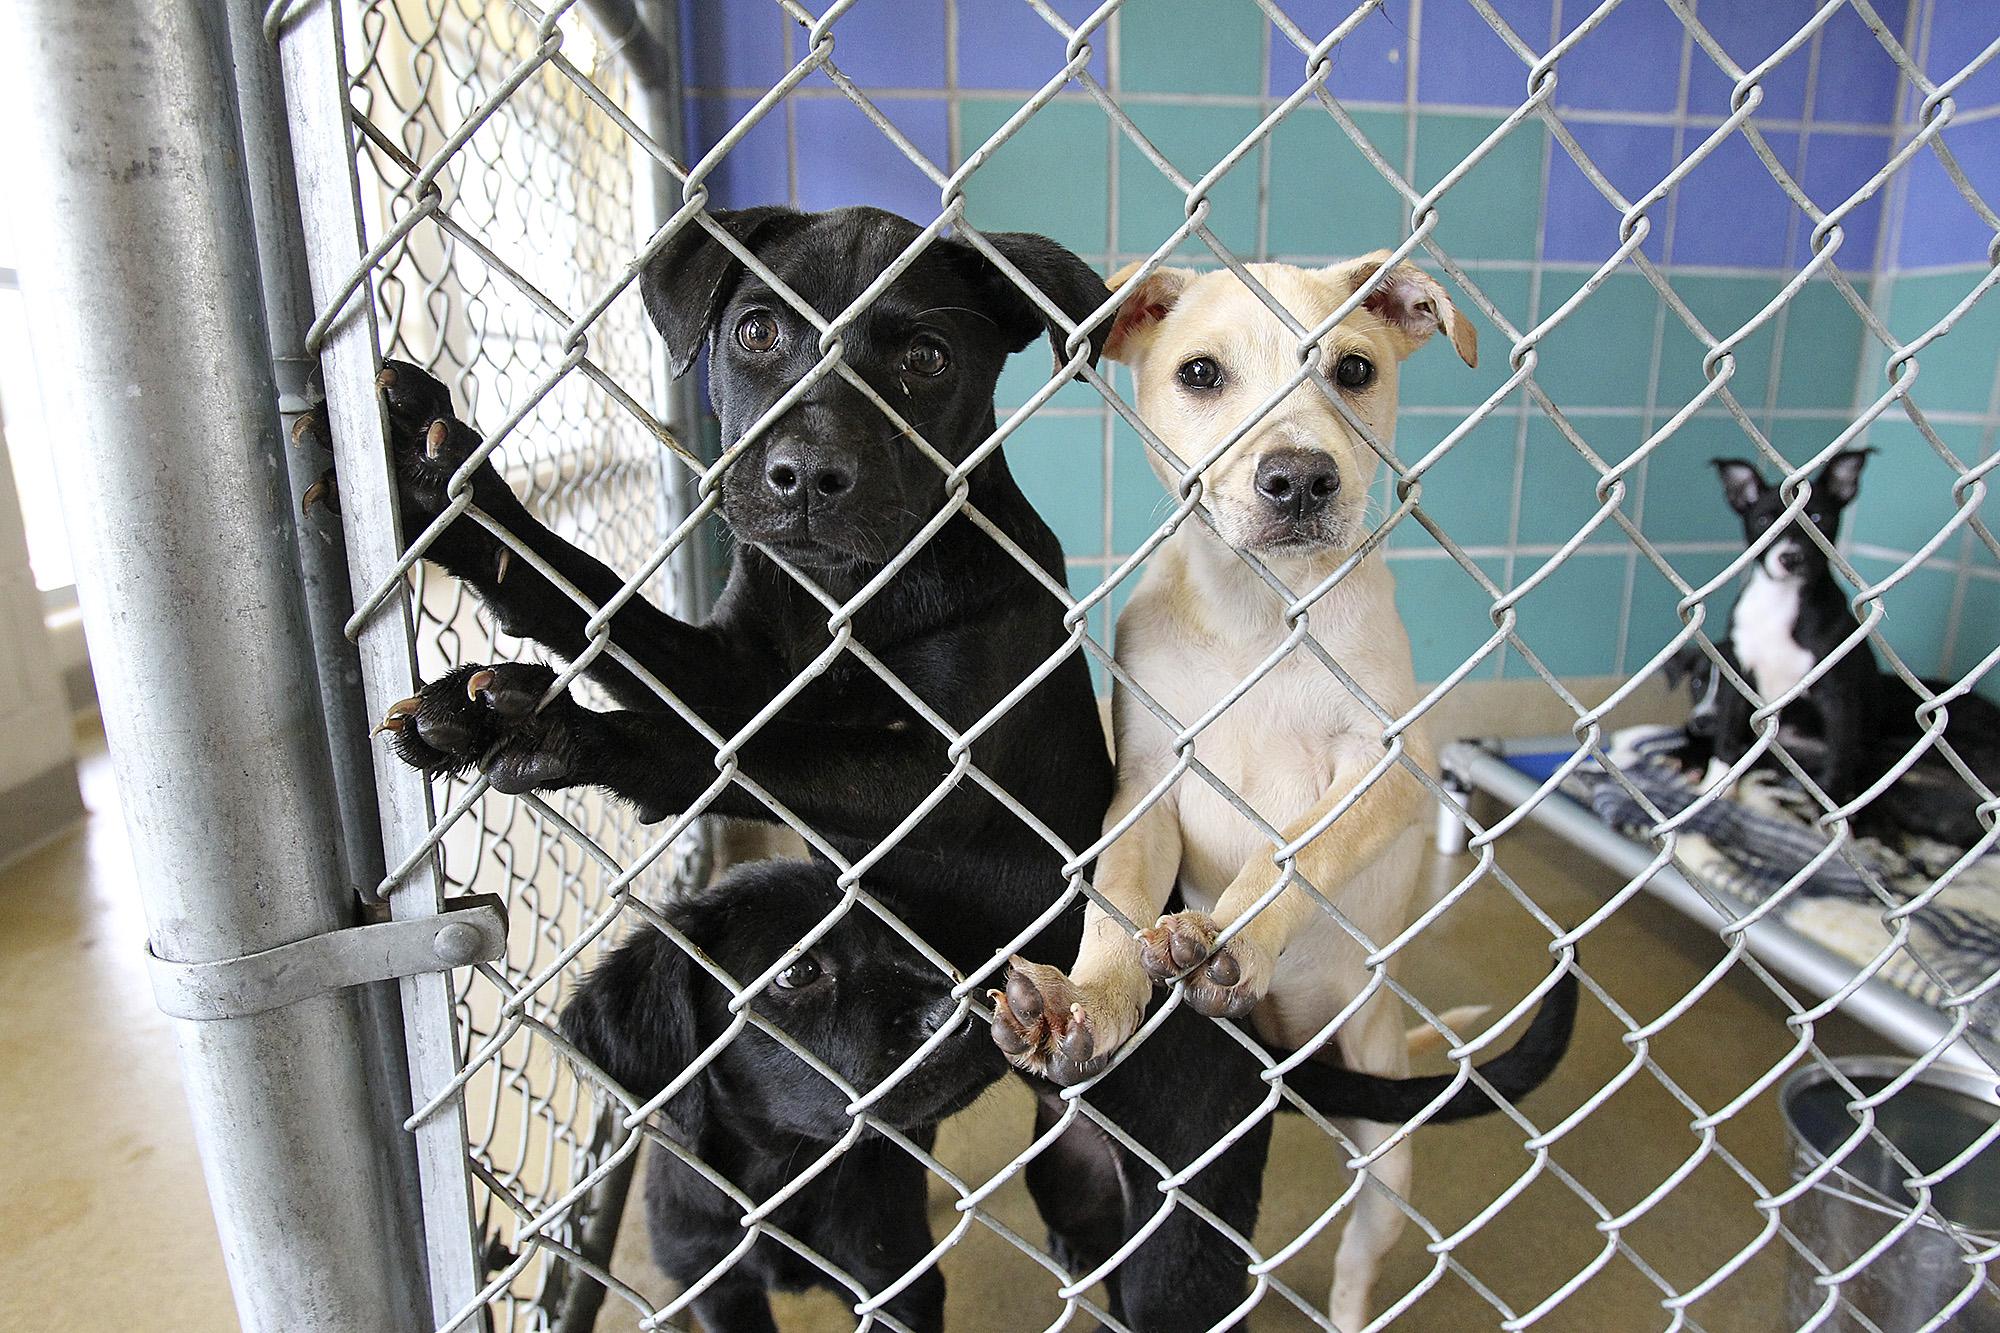 San Antonio Pets Alive saves thousands of animals - San